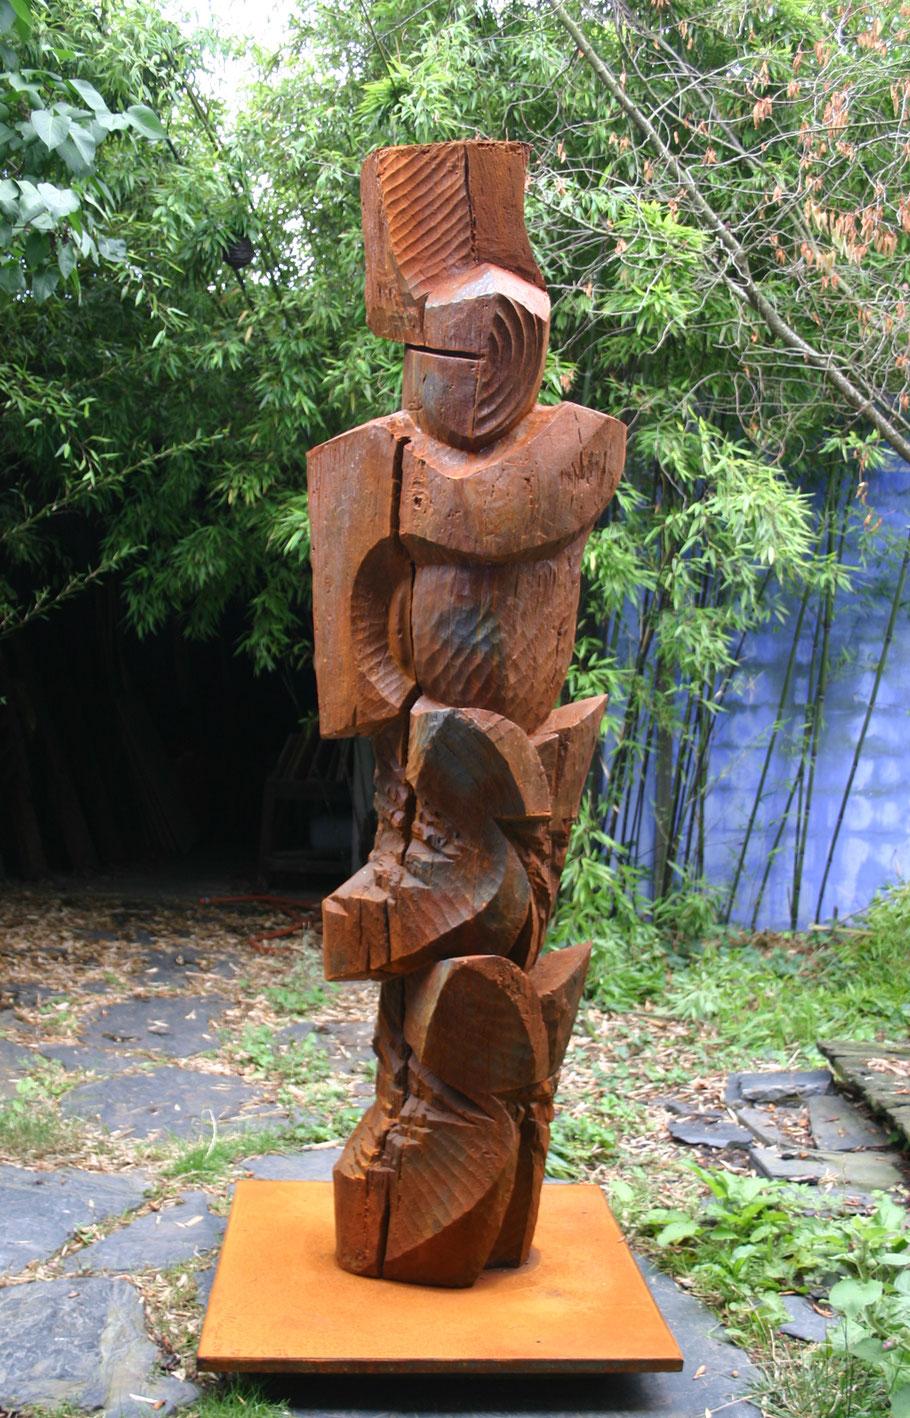 Enki, 2009, cast iron I/I, 230 x 98 x 96 cm © DR